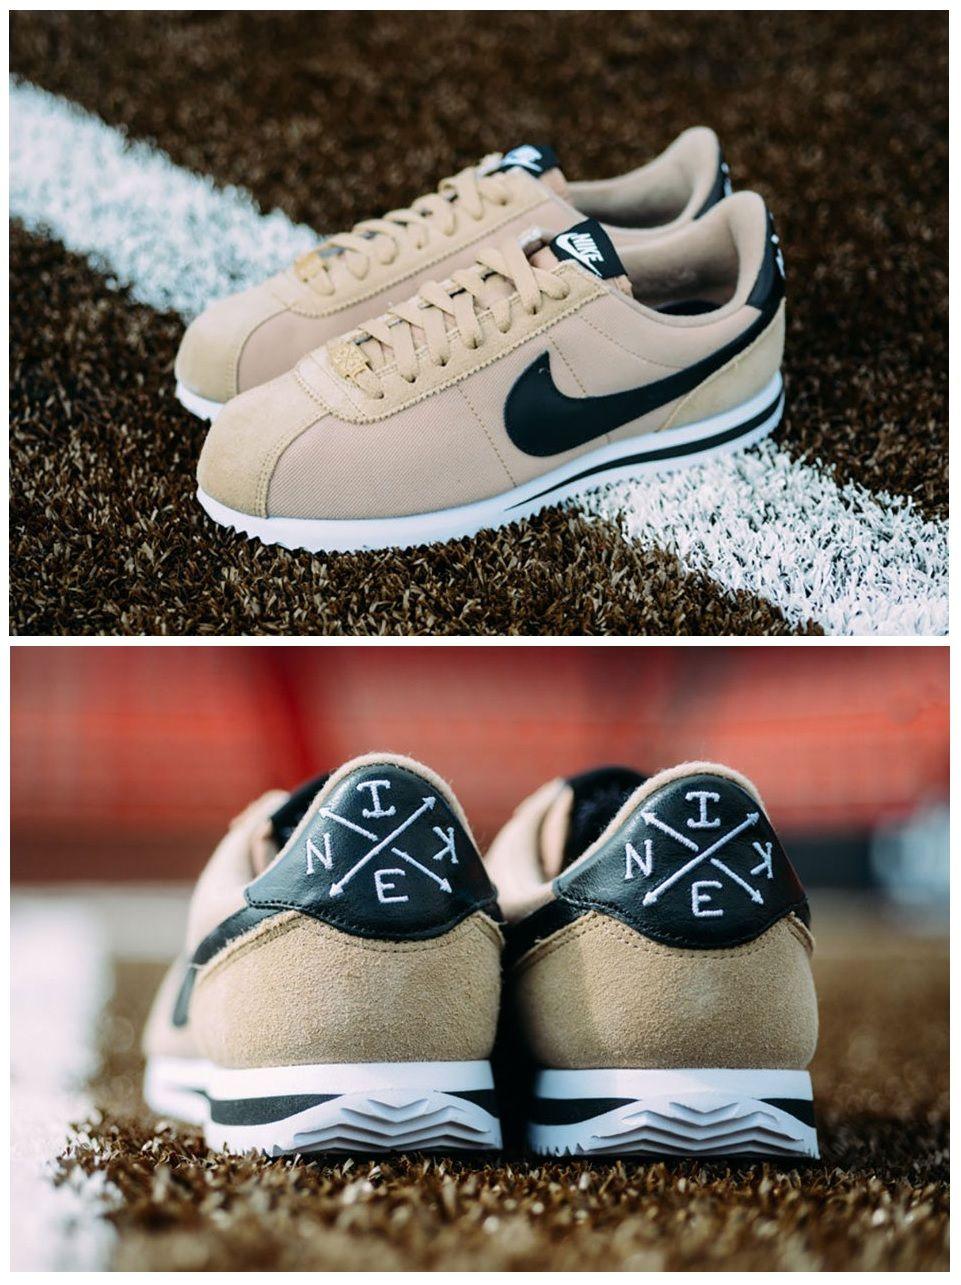 23eed18f59 Nike Cortez 'Baseball' Nike Cipők, Divatcipők, Férfi Divat, Férfiruhák,  Férfi